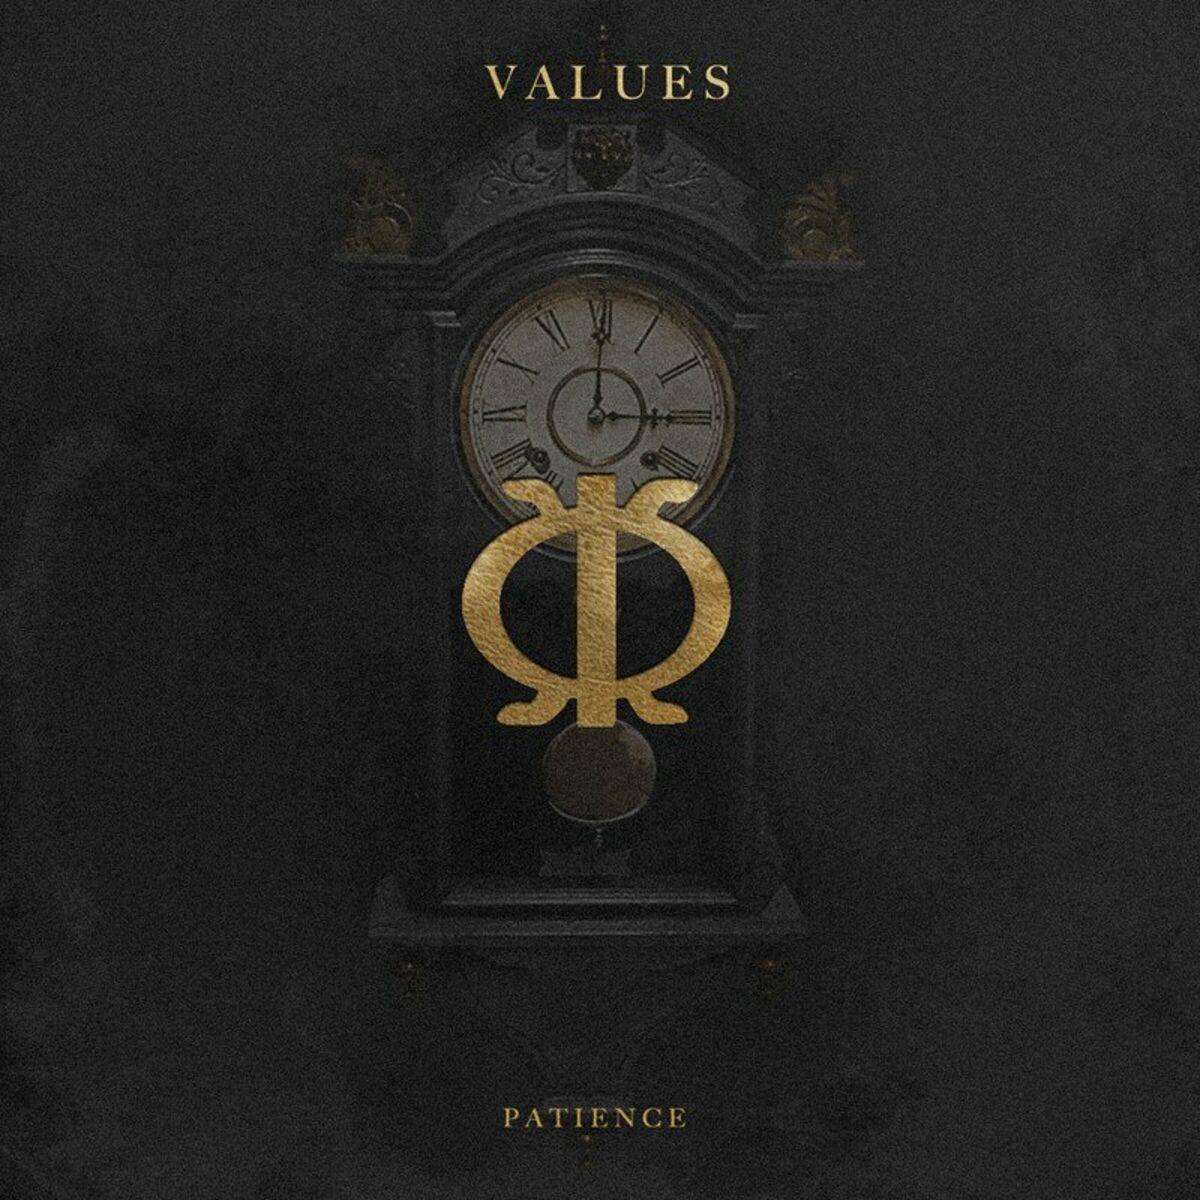 Values - Patience [single] (2020)